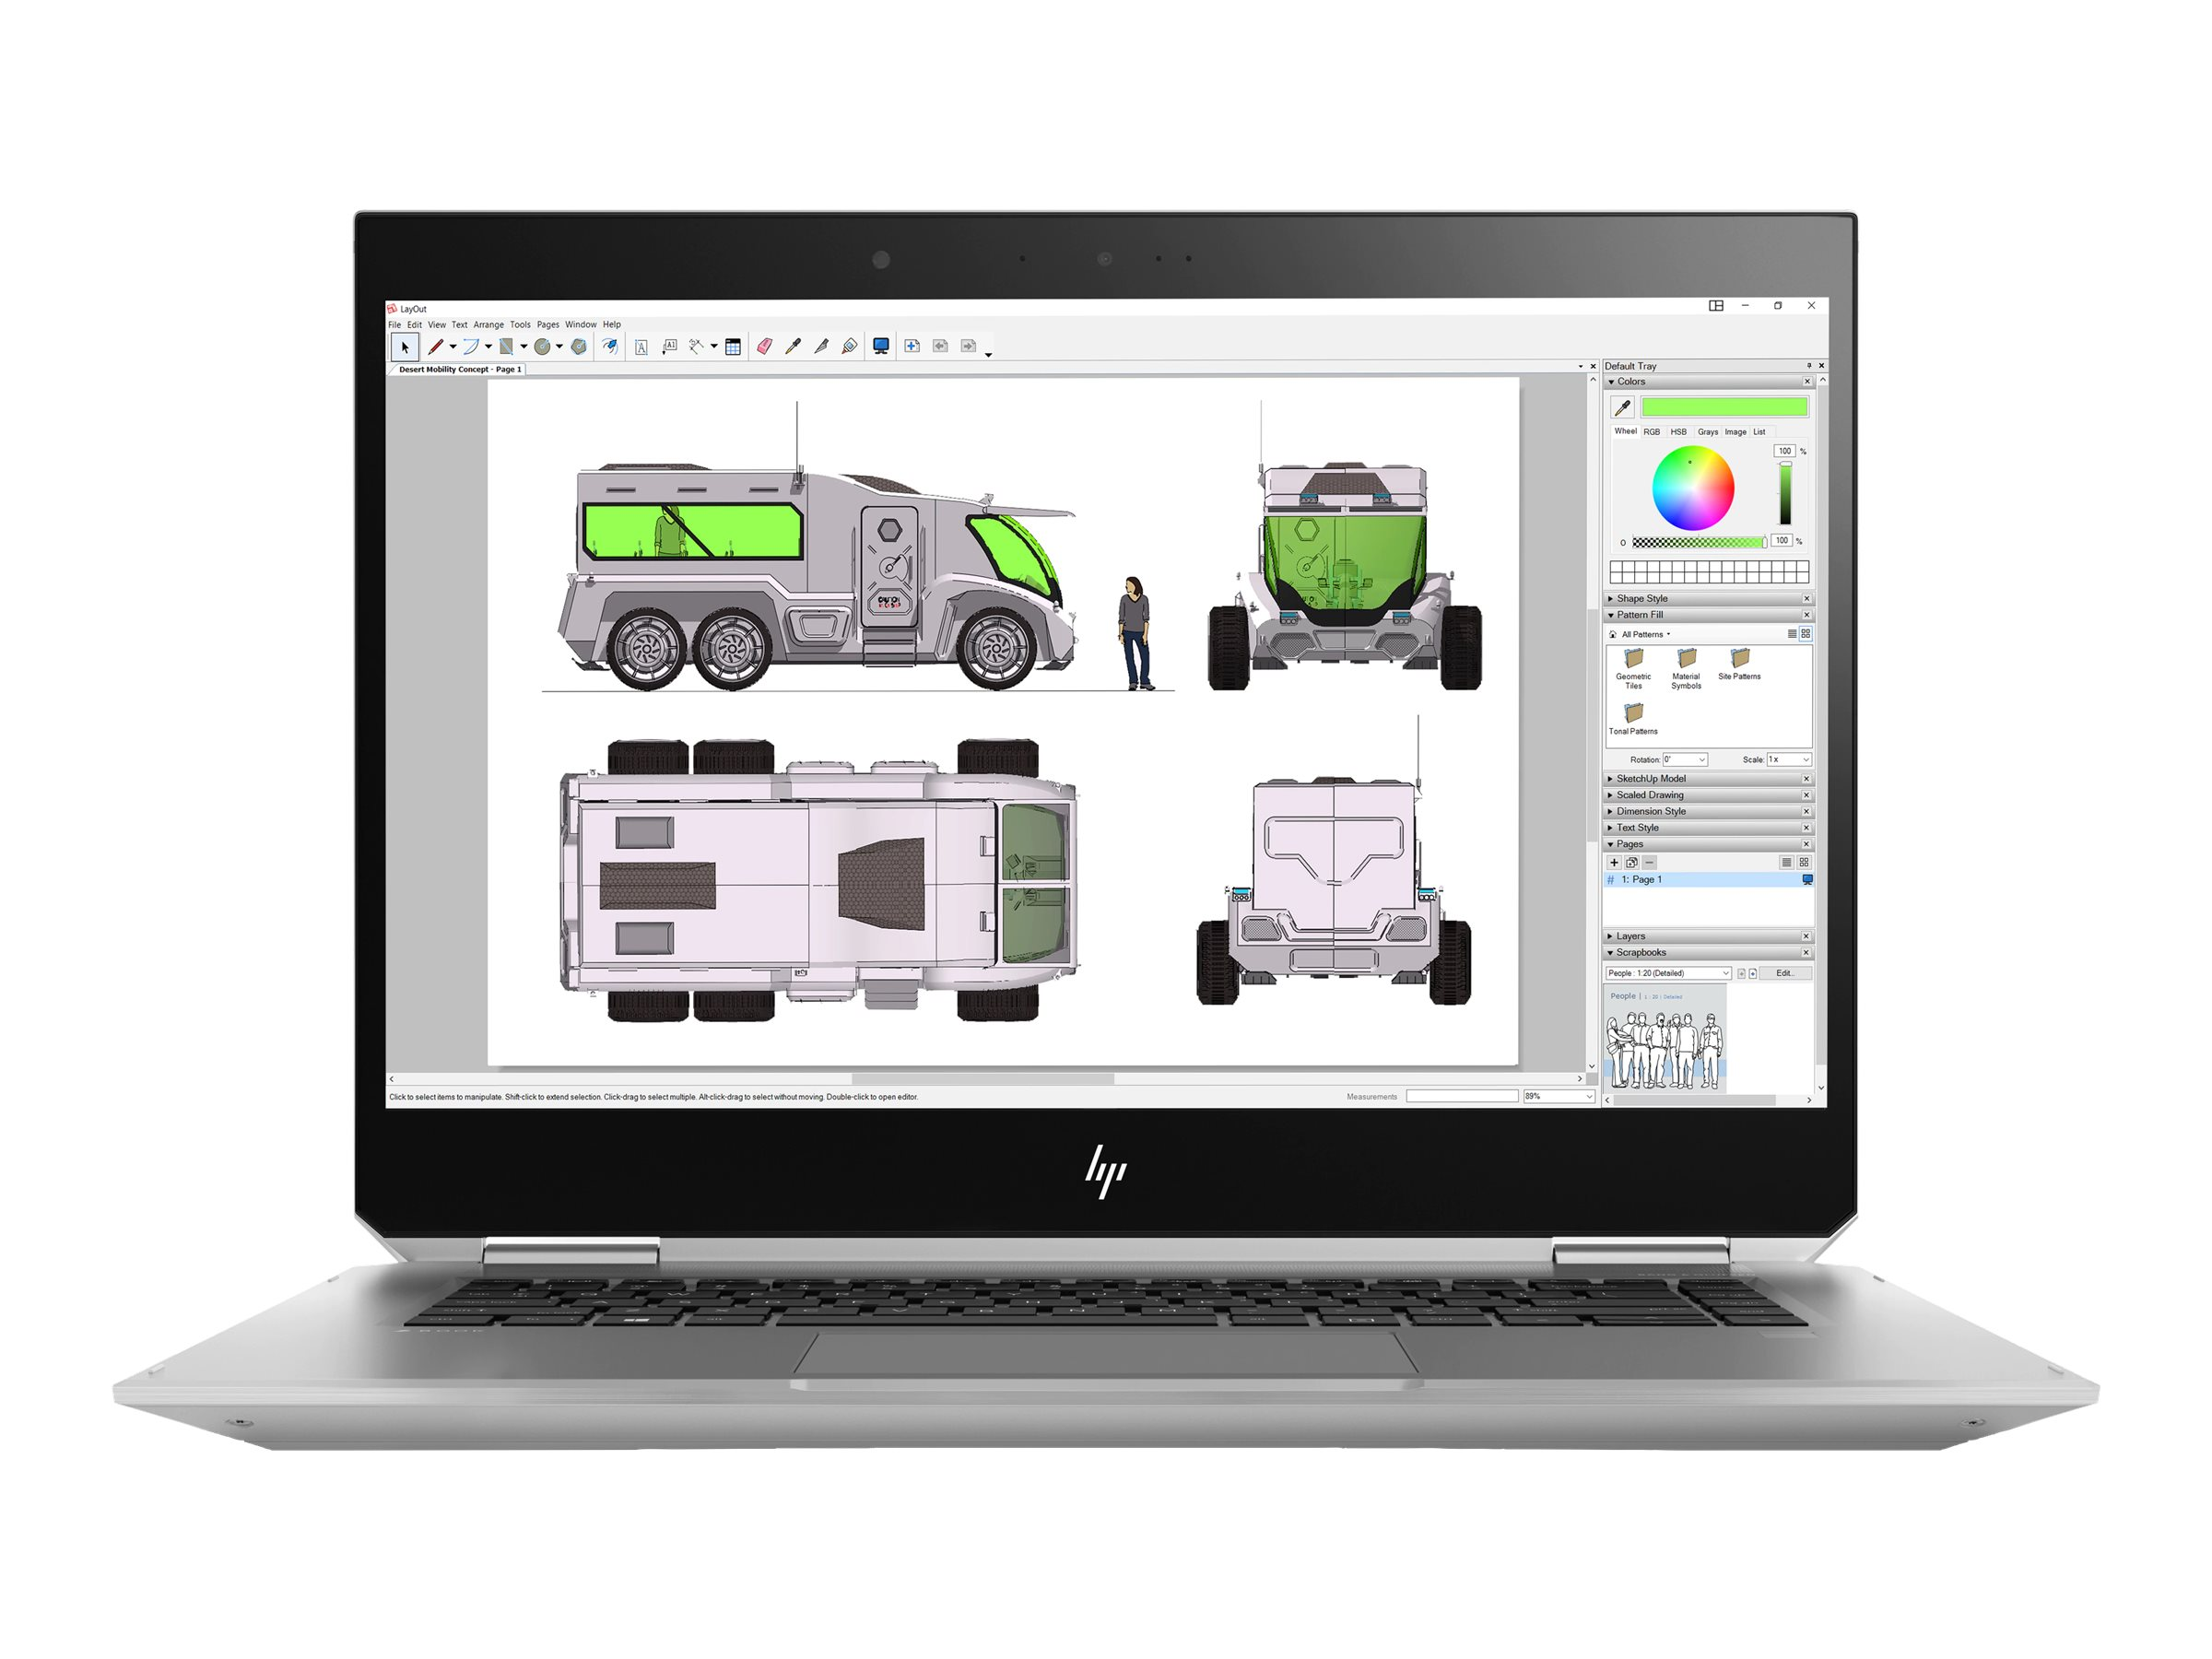 Hp zbook studio x360 g5 mobile workstation flip design core i7 8750h 2 2 ghz win 10 pro 64 bit 16 gb ram 512 gb ssd 16 gb ssd cache sed nvme 9038472 4qh13ea abd